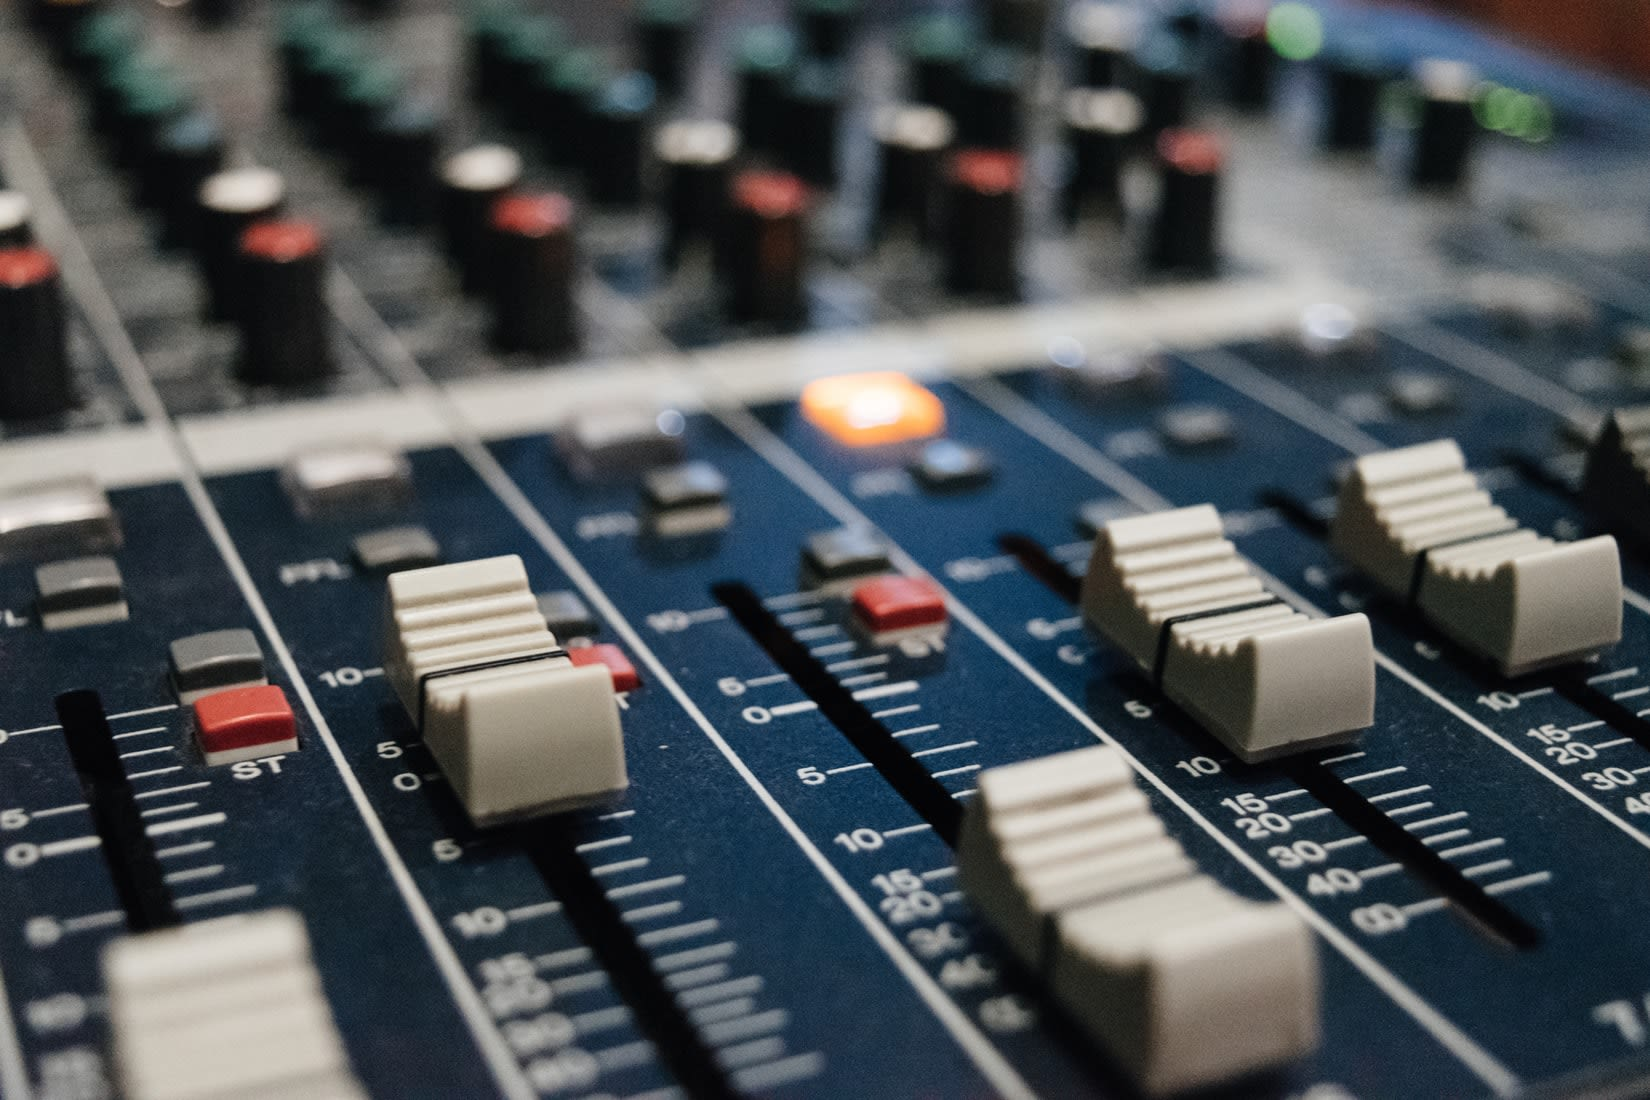 Students in the Cam FM studio